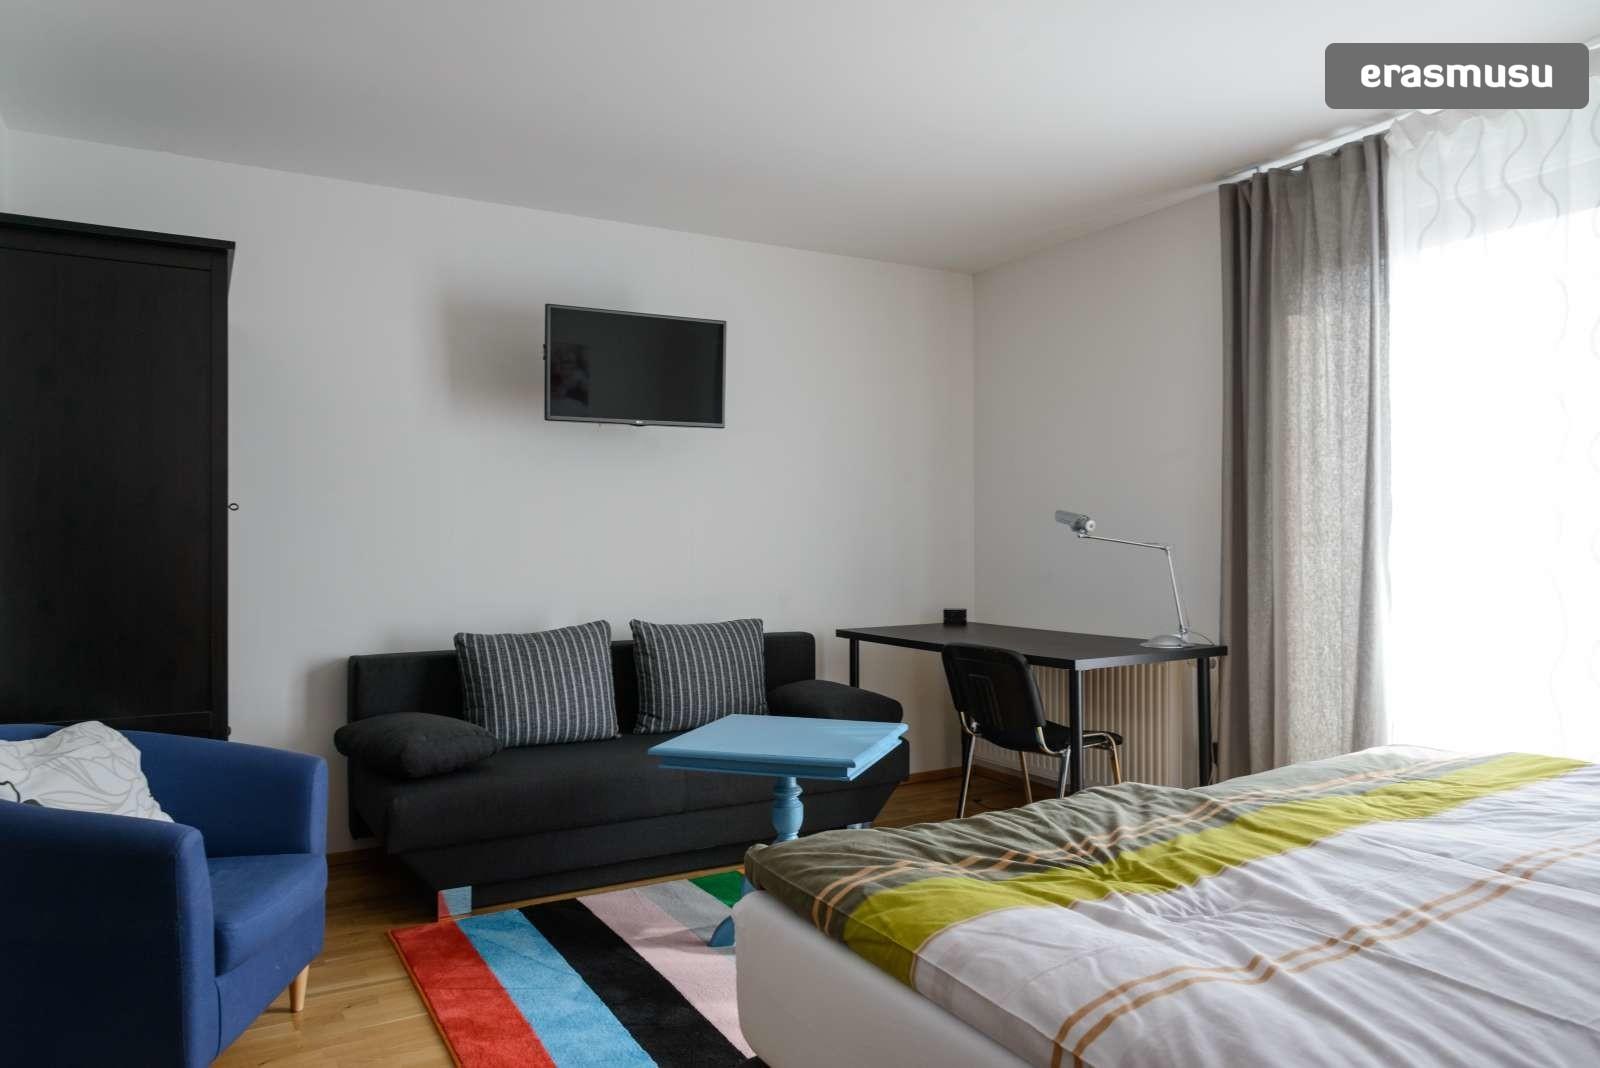 spacious-studio-apartment-rent-aspern-area-donaustadt-dfbf075af7